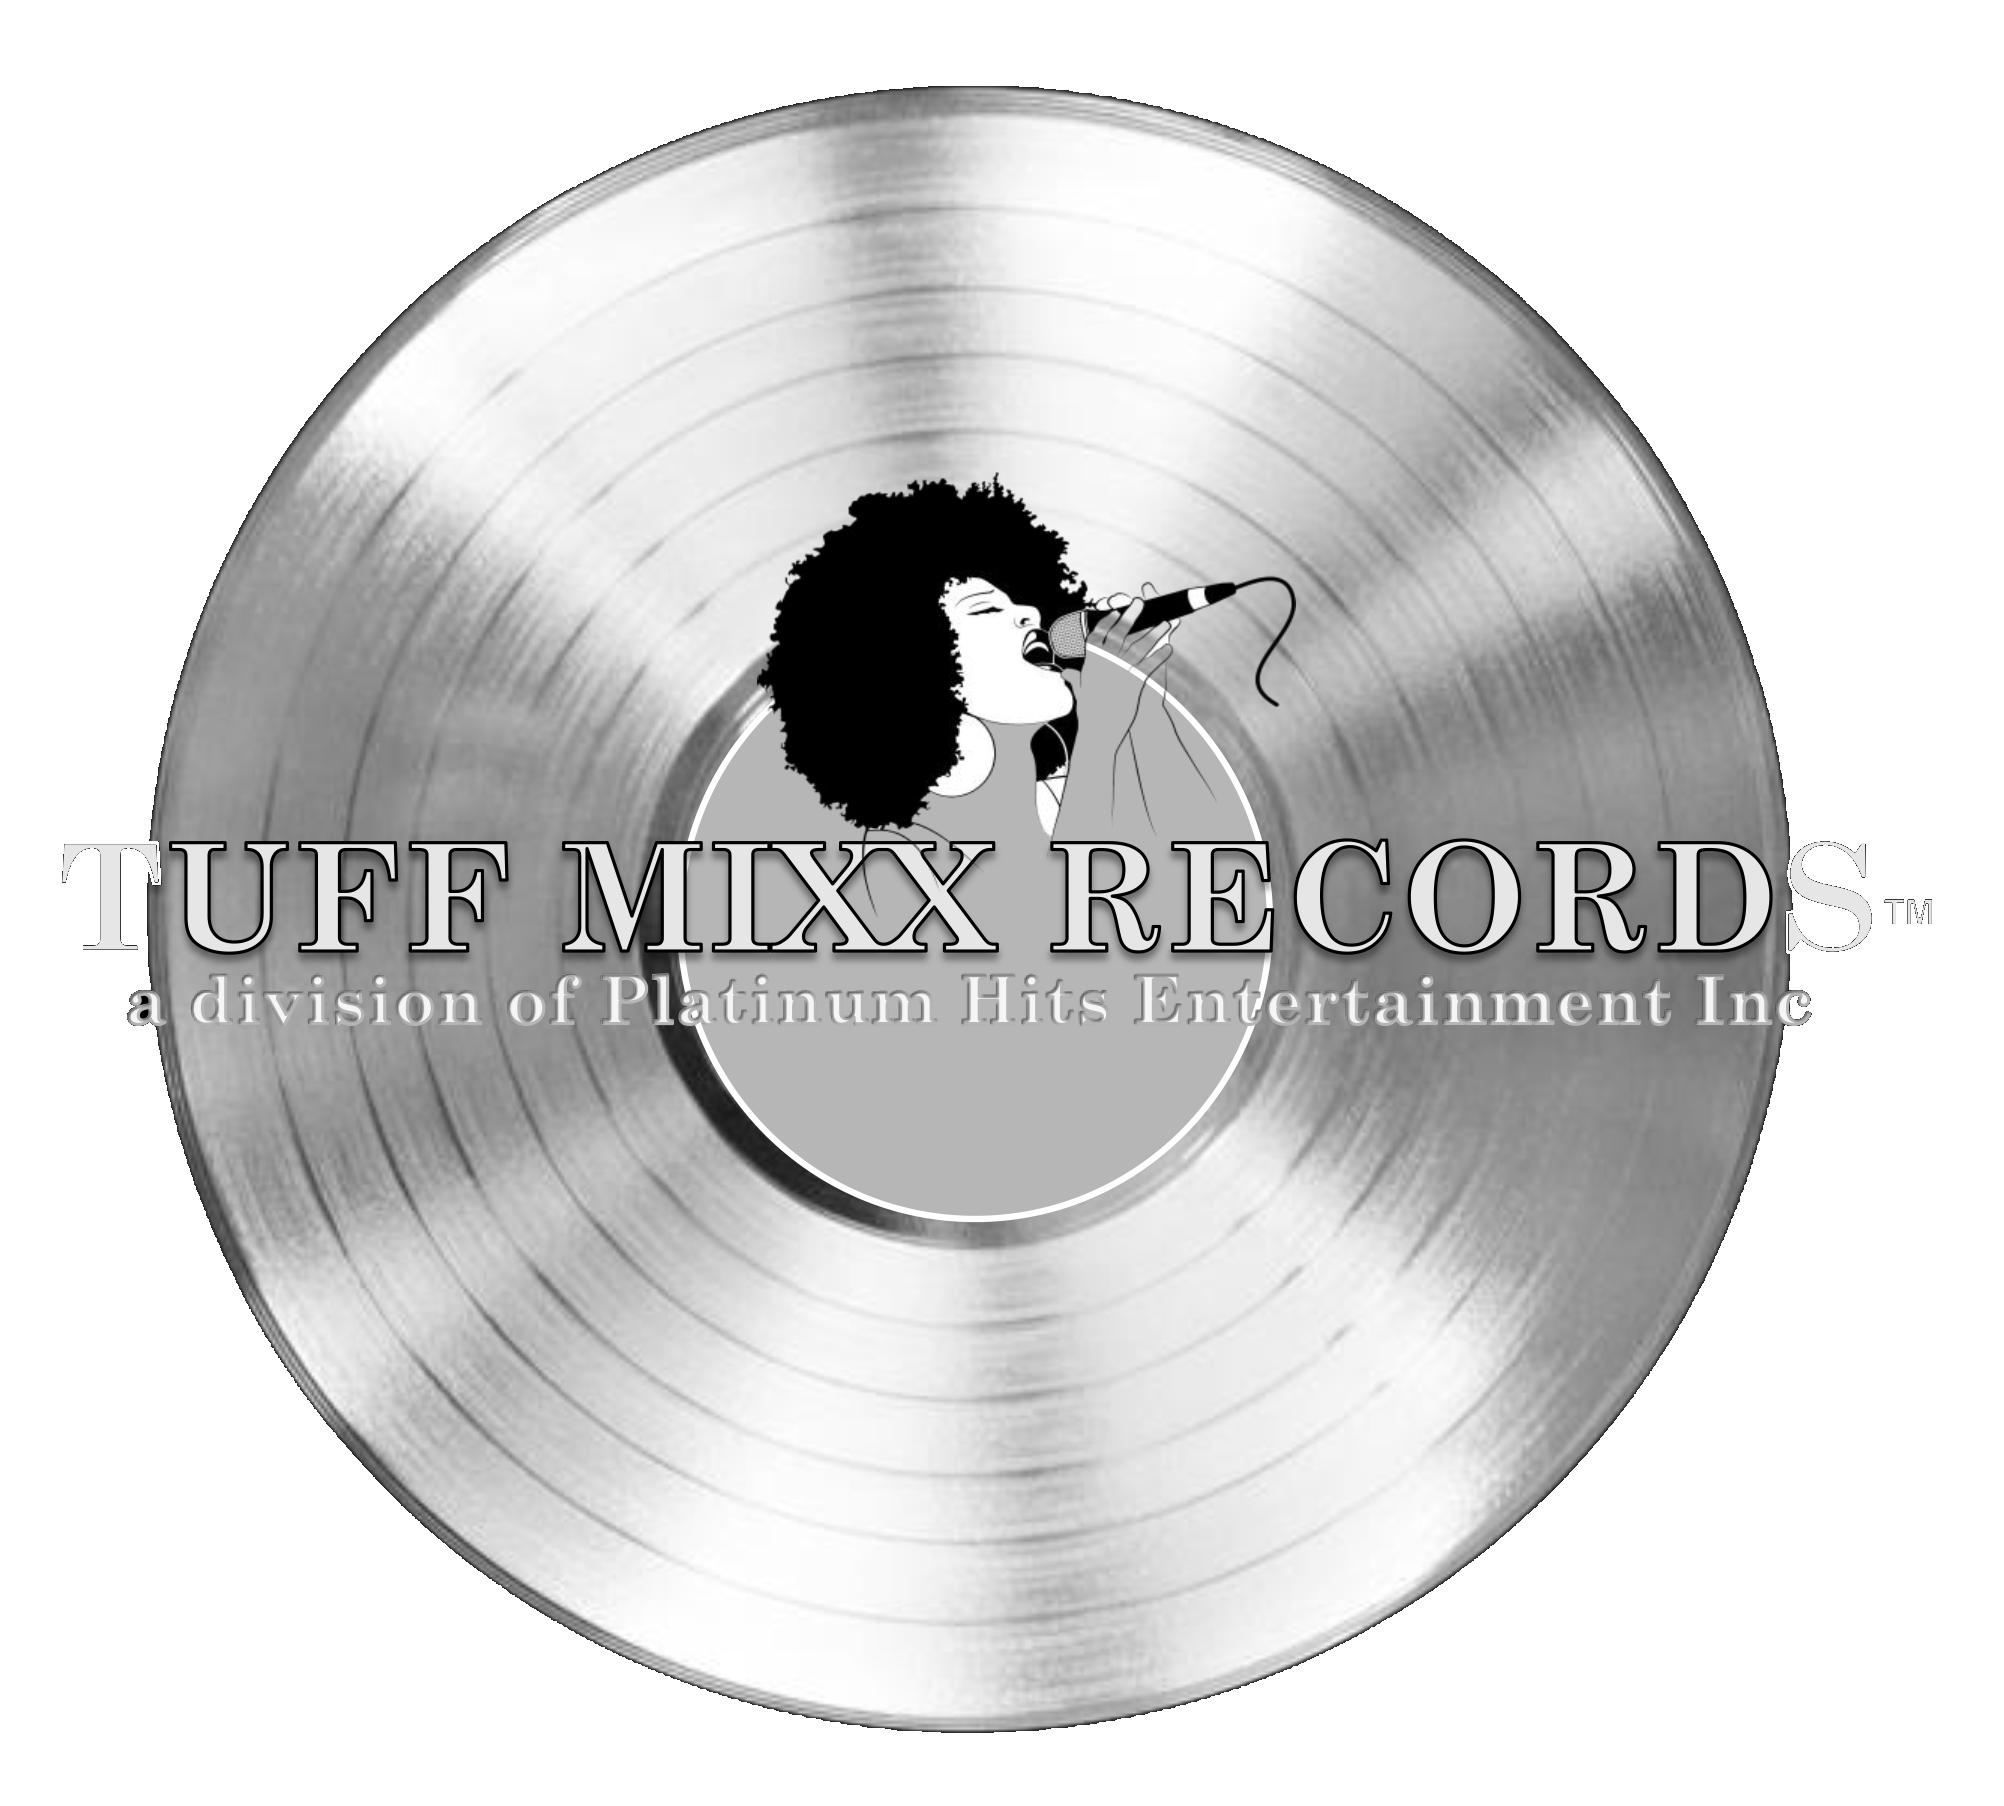 TUFF MIXX RECORDS LOGO TRANSPARENT